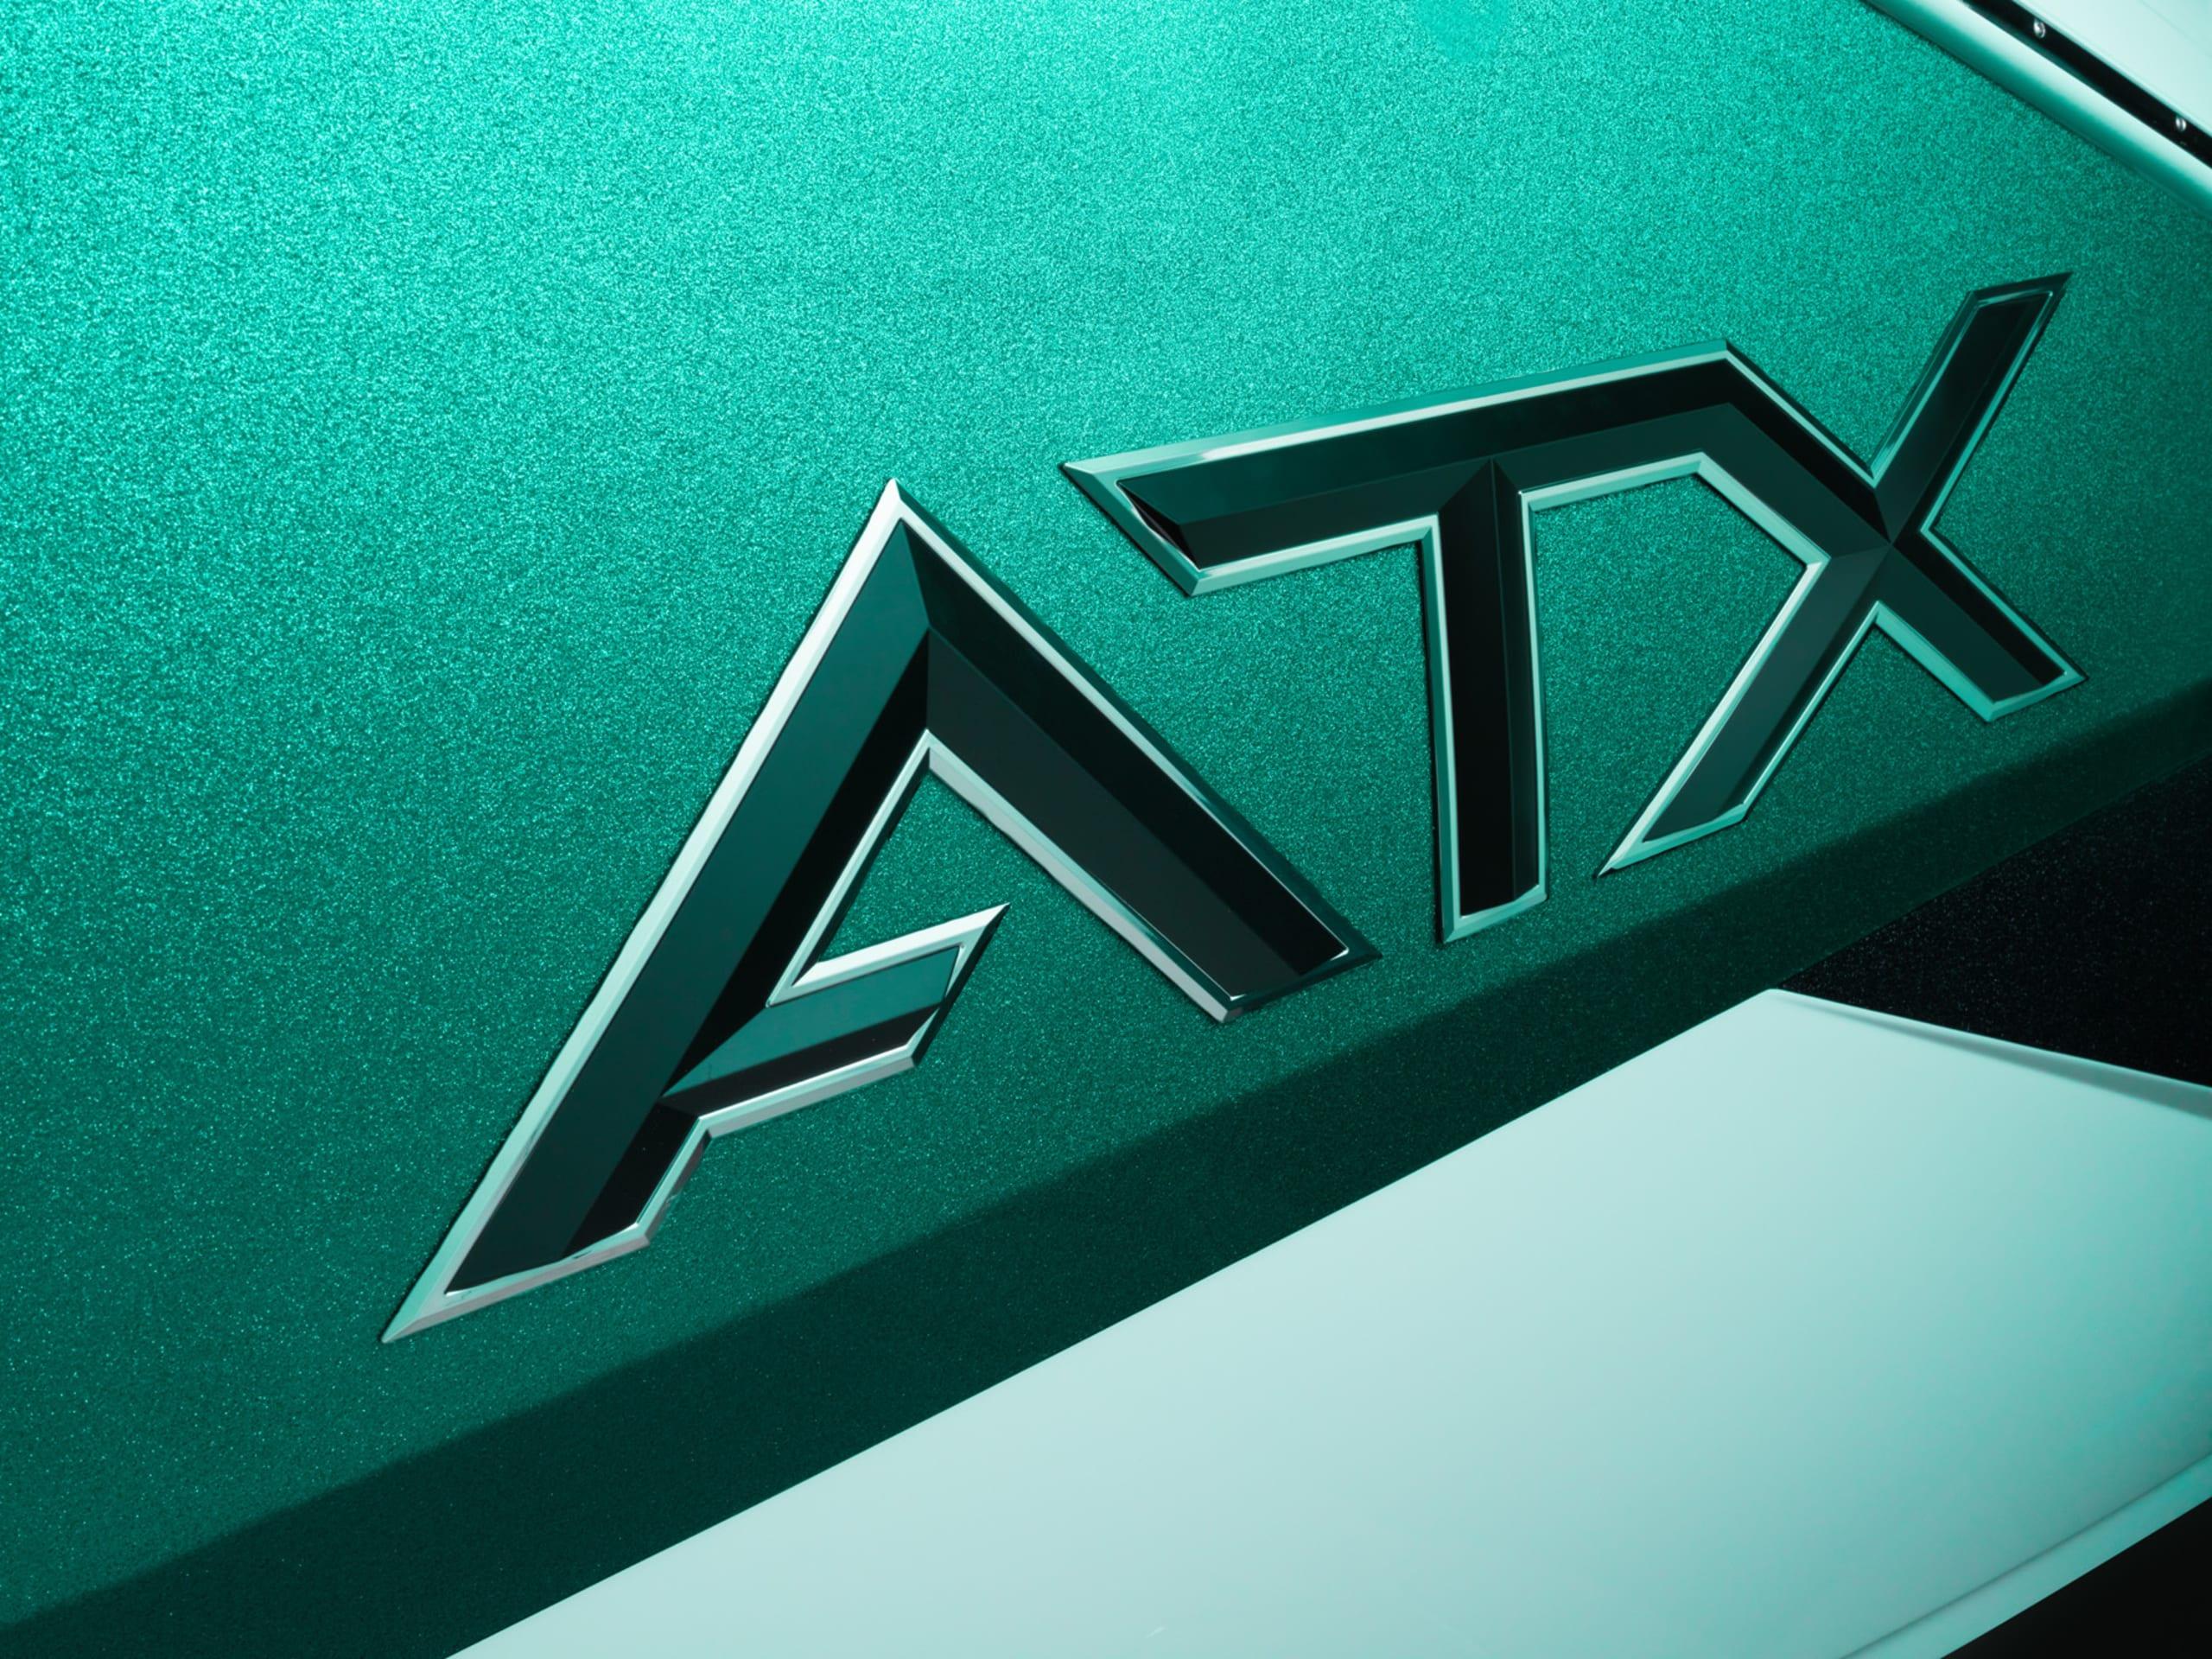 2021 AT24 Type S ATX Boats Bradlee Rutledge 0516 2 1